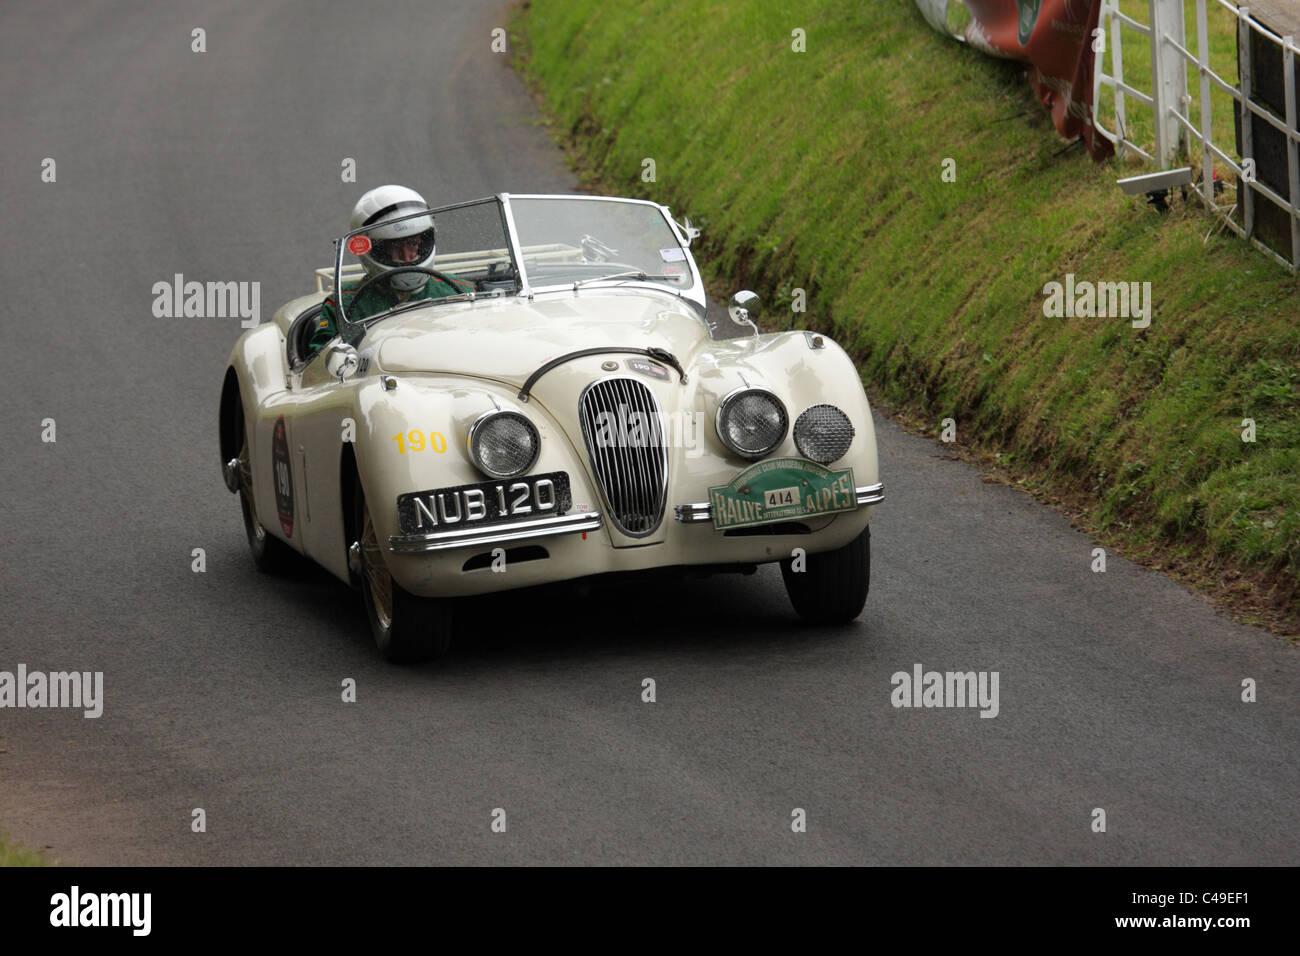 Ein Jaguar XK120 Shelsley Walsh Hill climb, Worcestershire, England, während die Jaguar-Jahr-Feier im Juni Stockbild